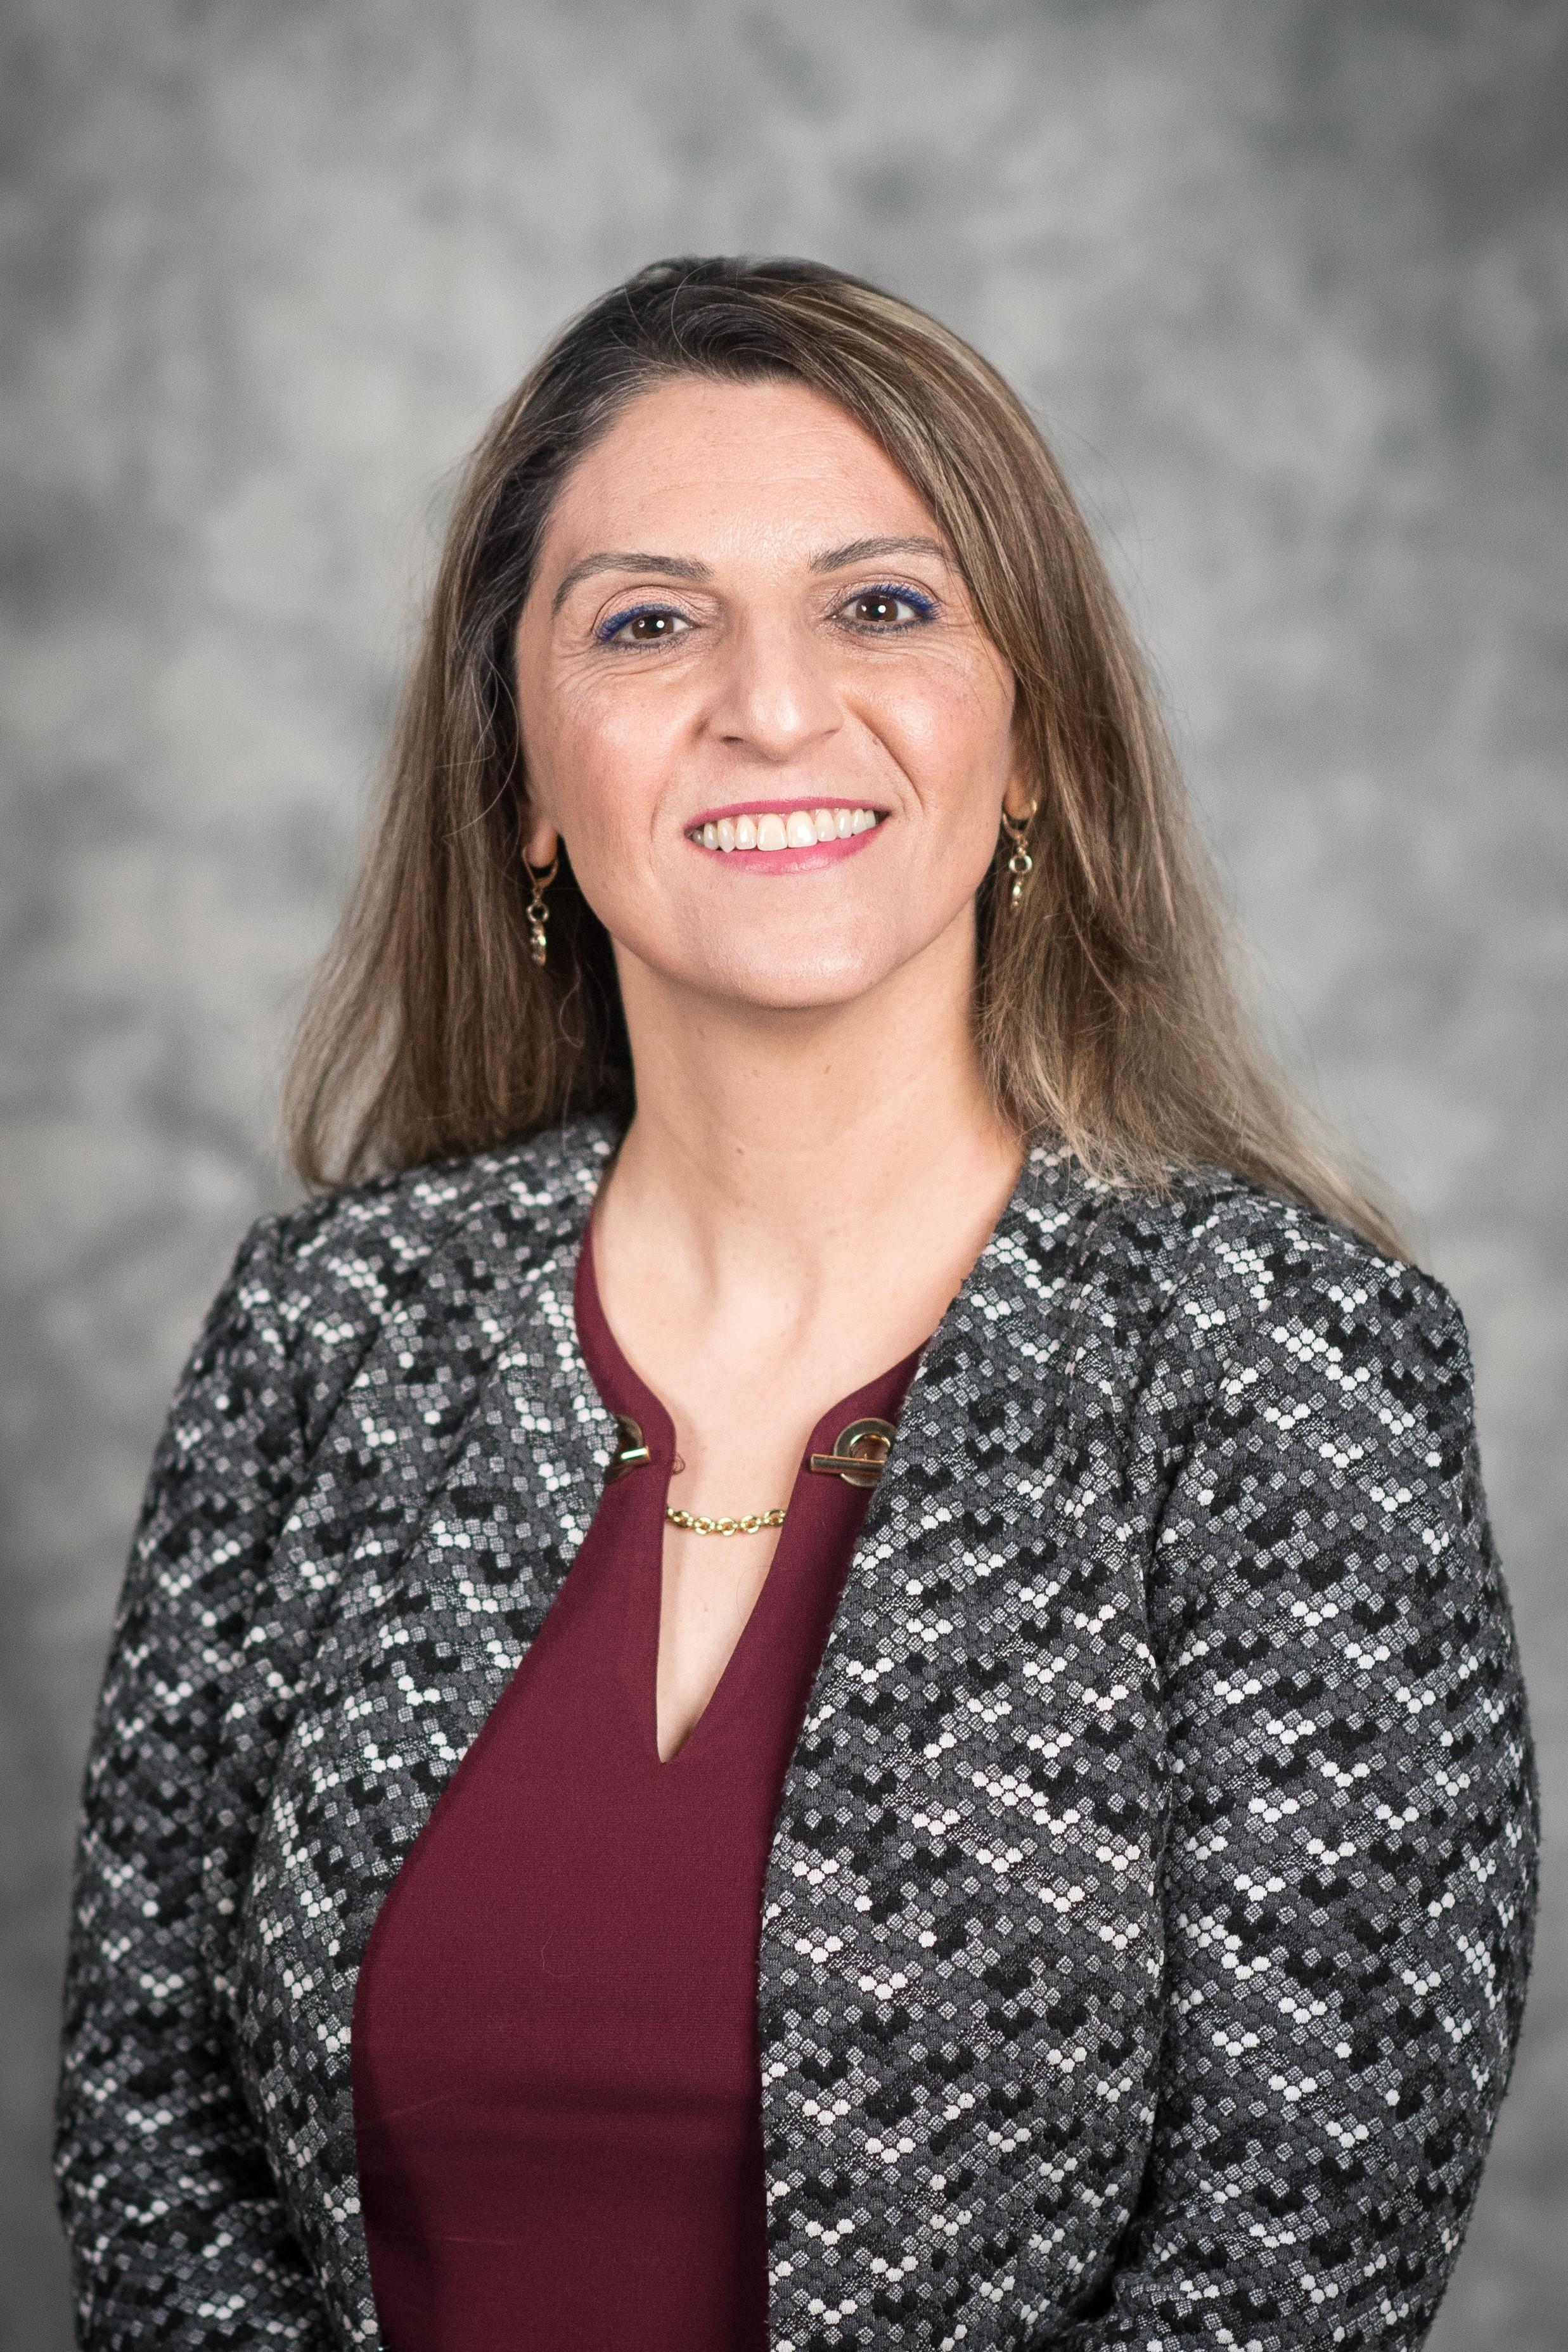 Nasrin Mirsaleh-Kohan, Ph.D.